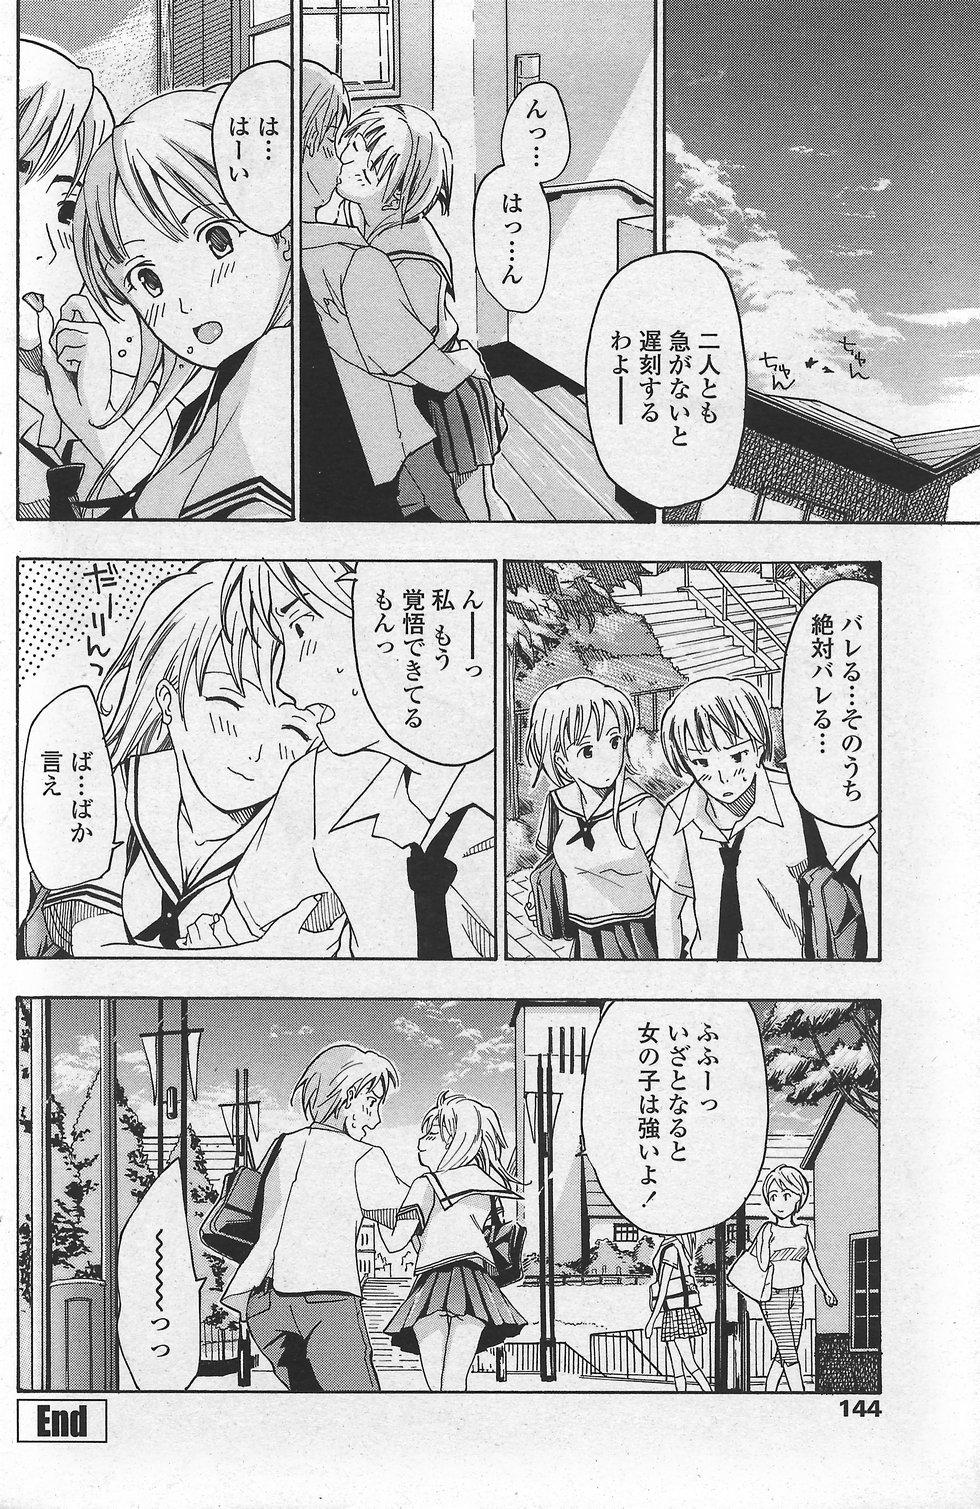 COMIC Penguin Club Sanzokuban 2007-10 Vol. 225 145